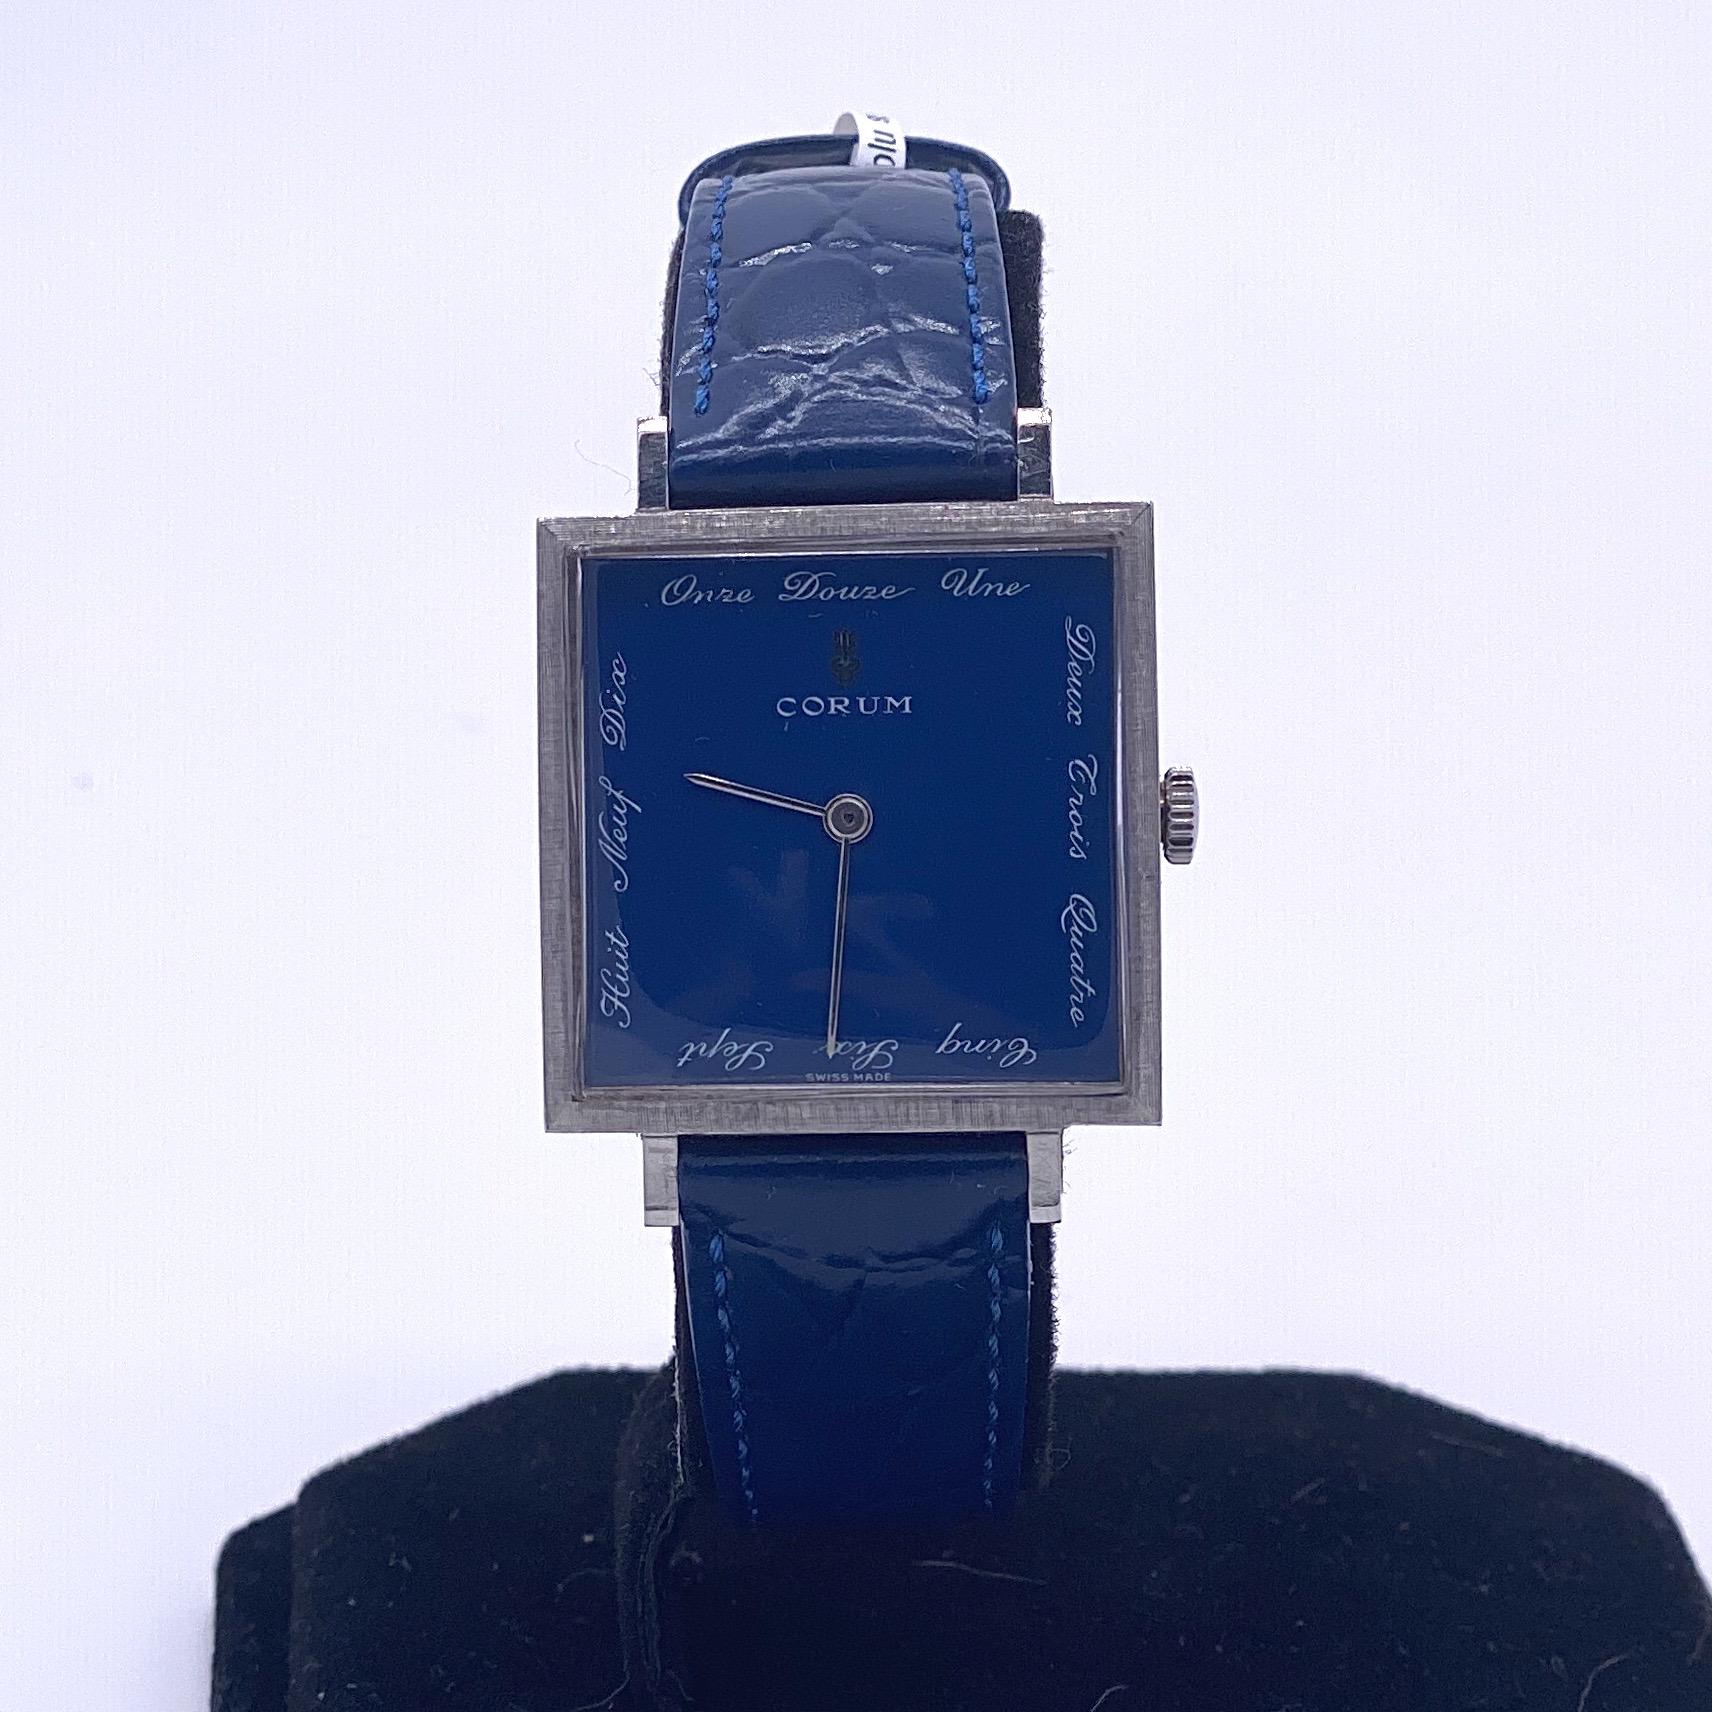 Lot 4 - Corum Buckingham Manual Wind Watch